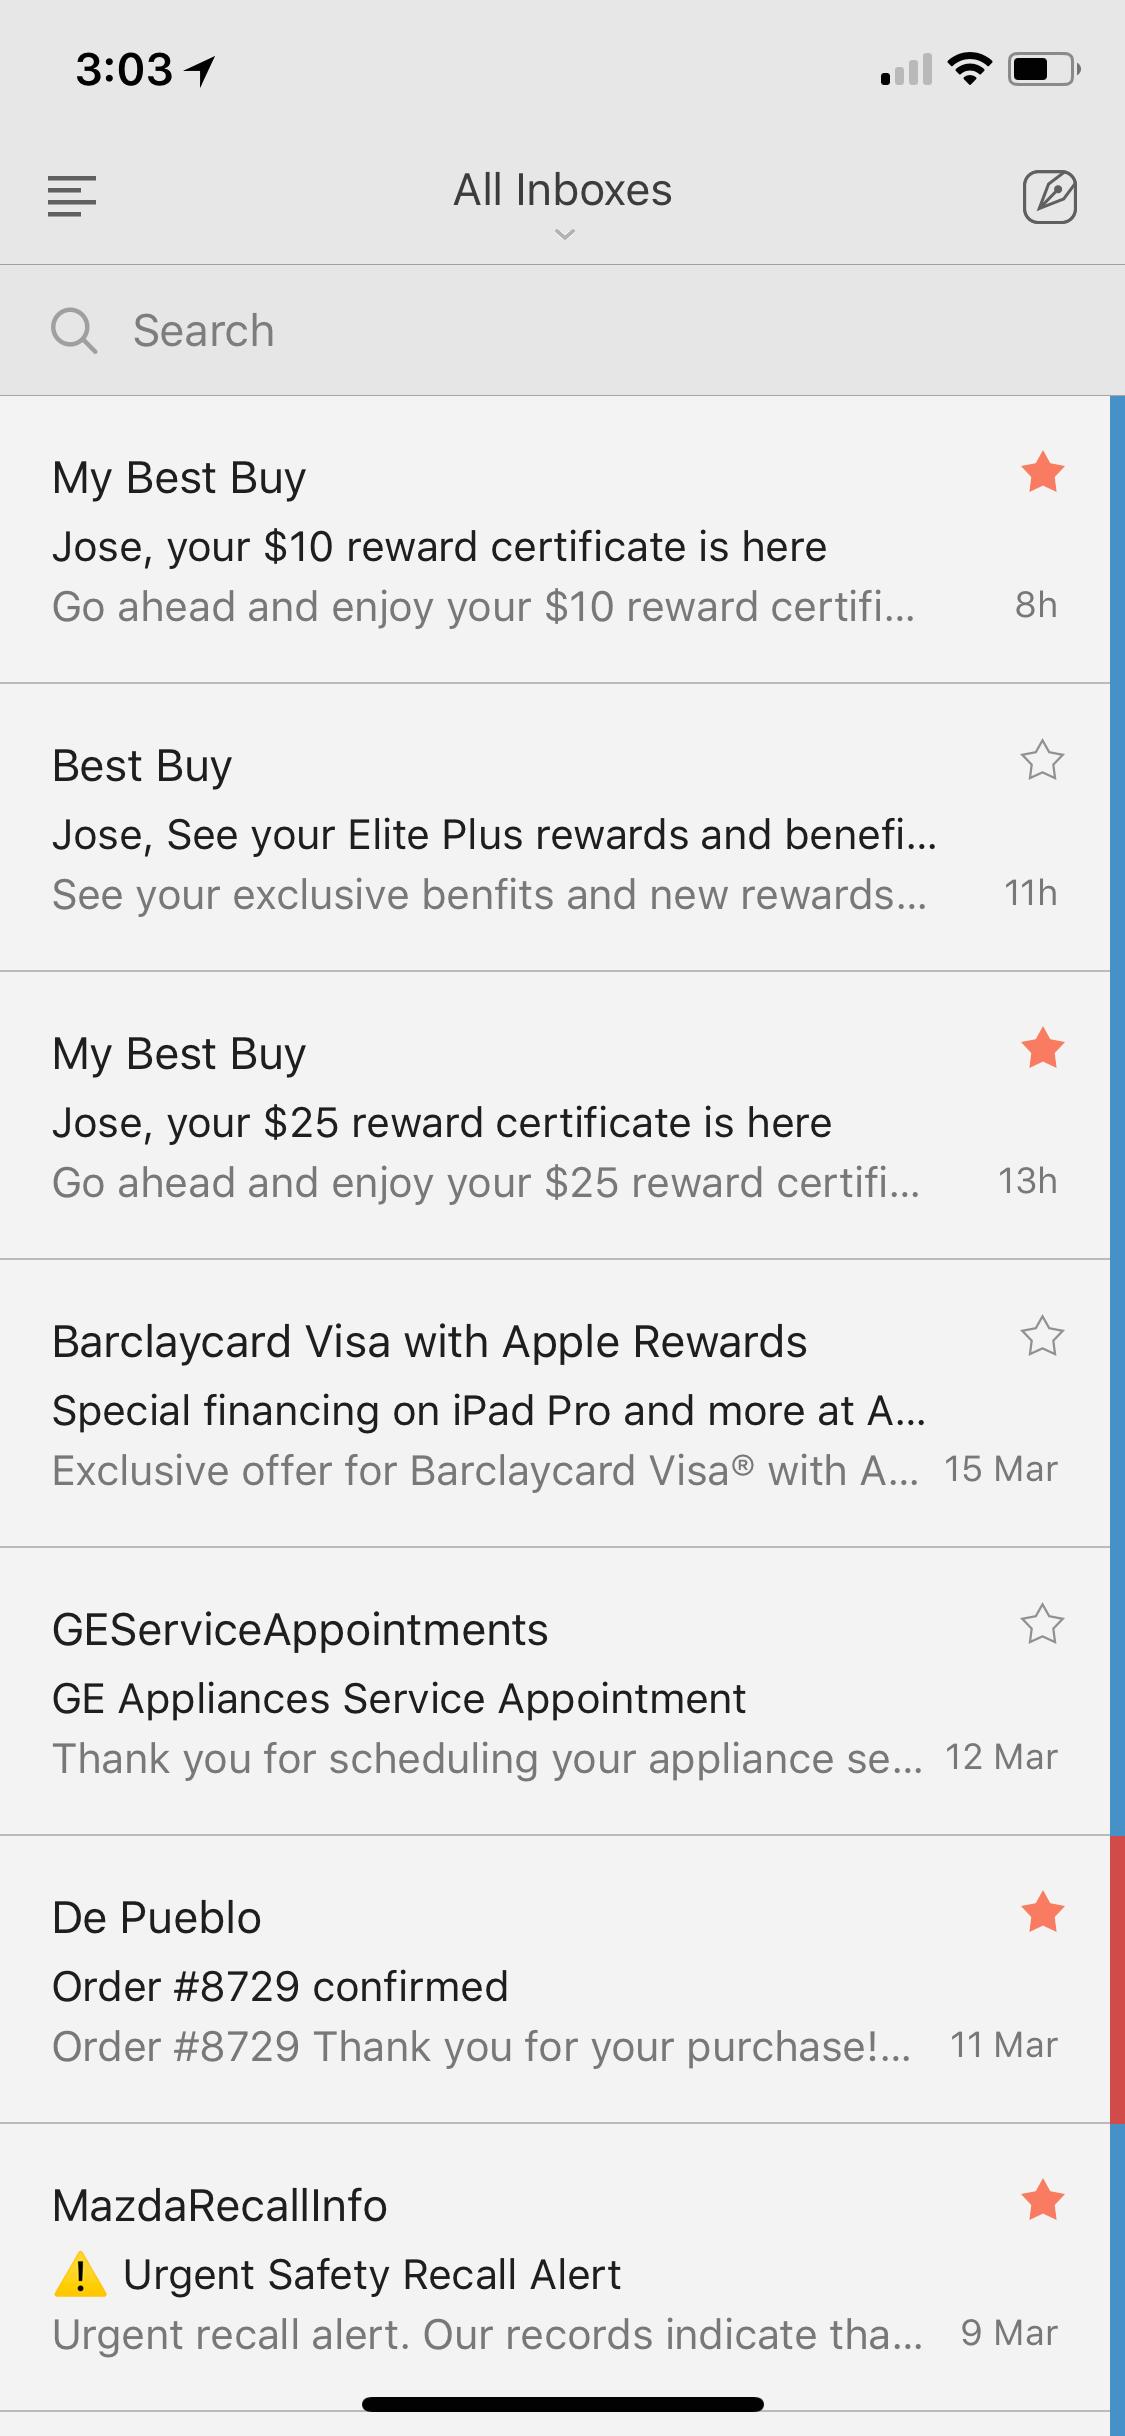 Newton Mail For iOS